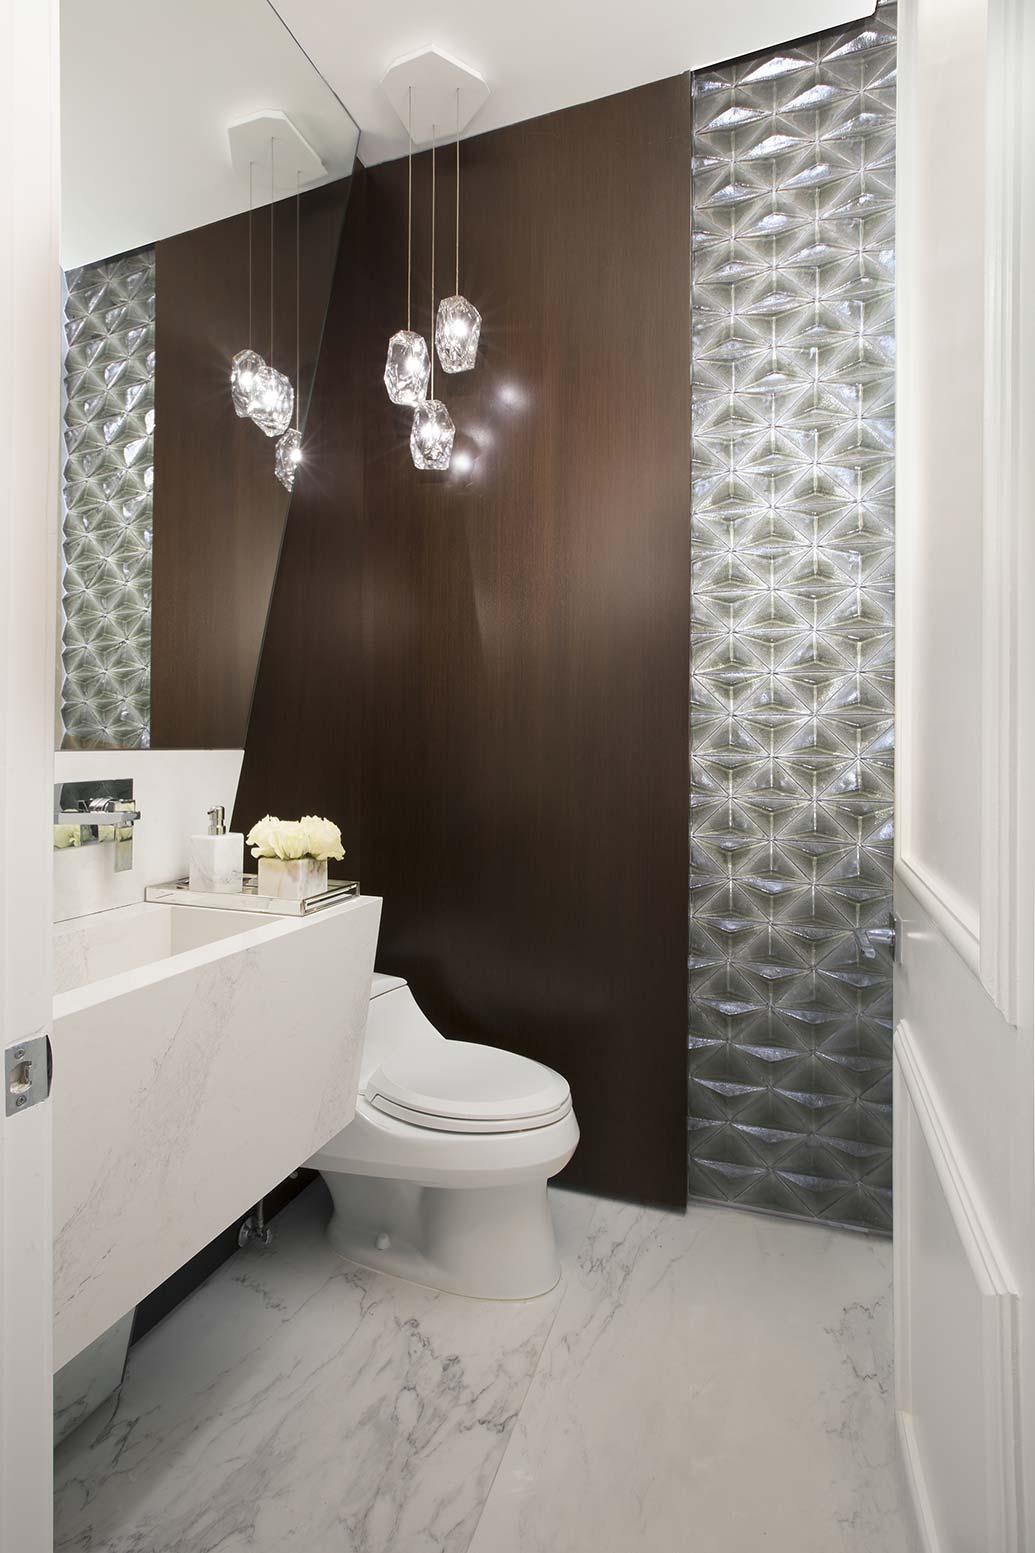 Miami Interior Design Firm - Powder Room Designs